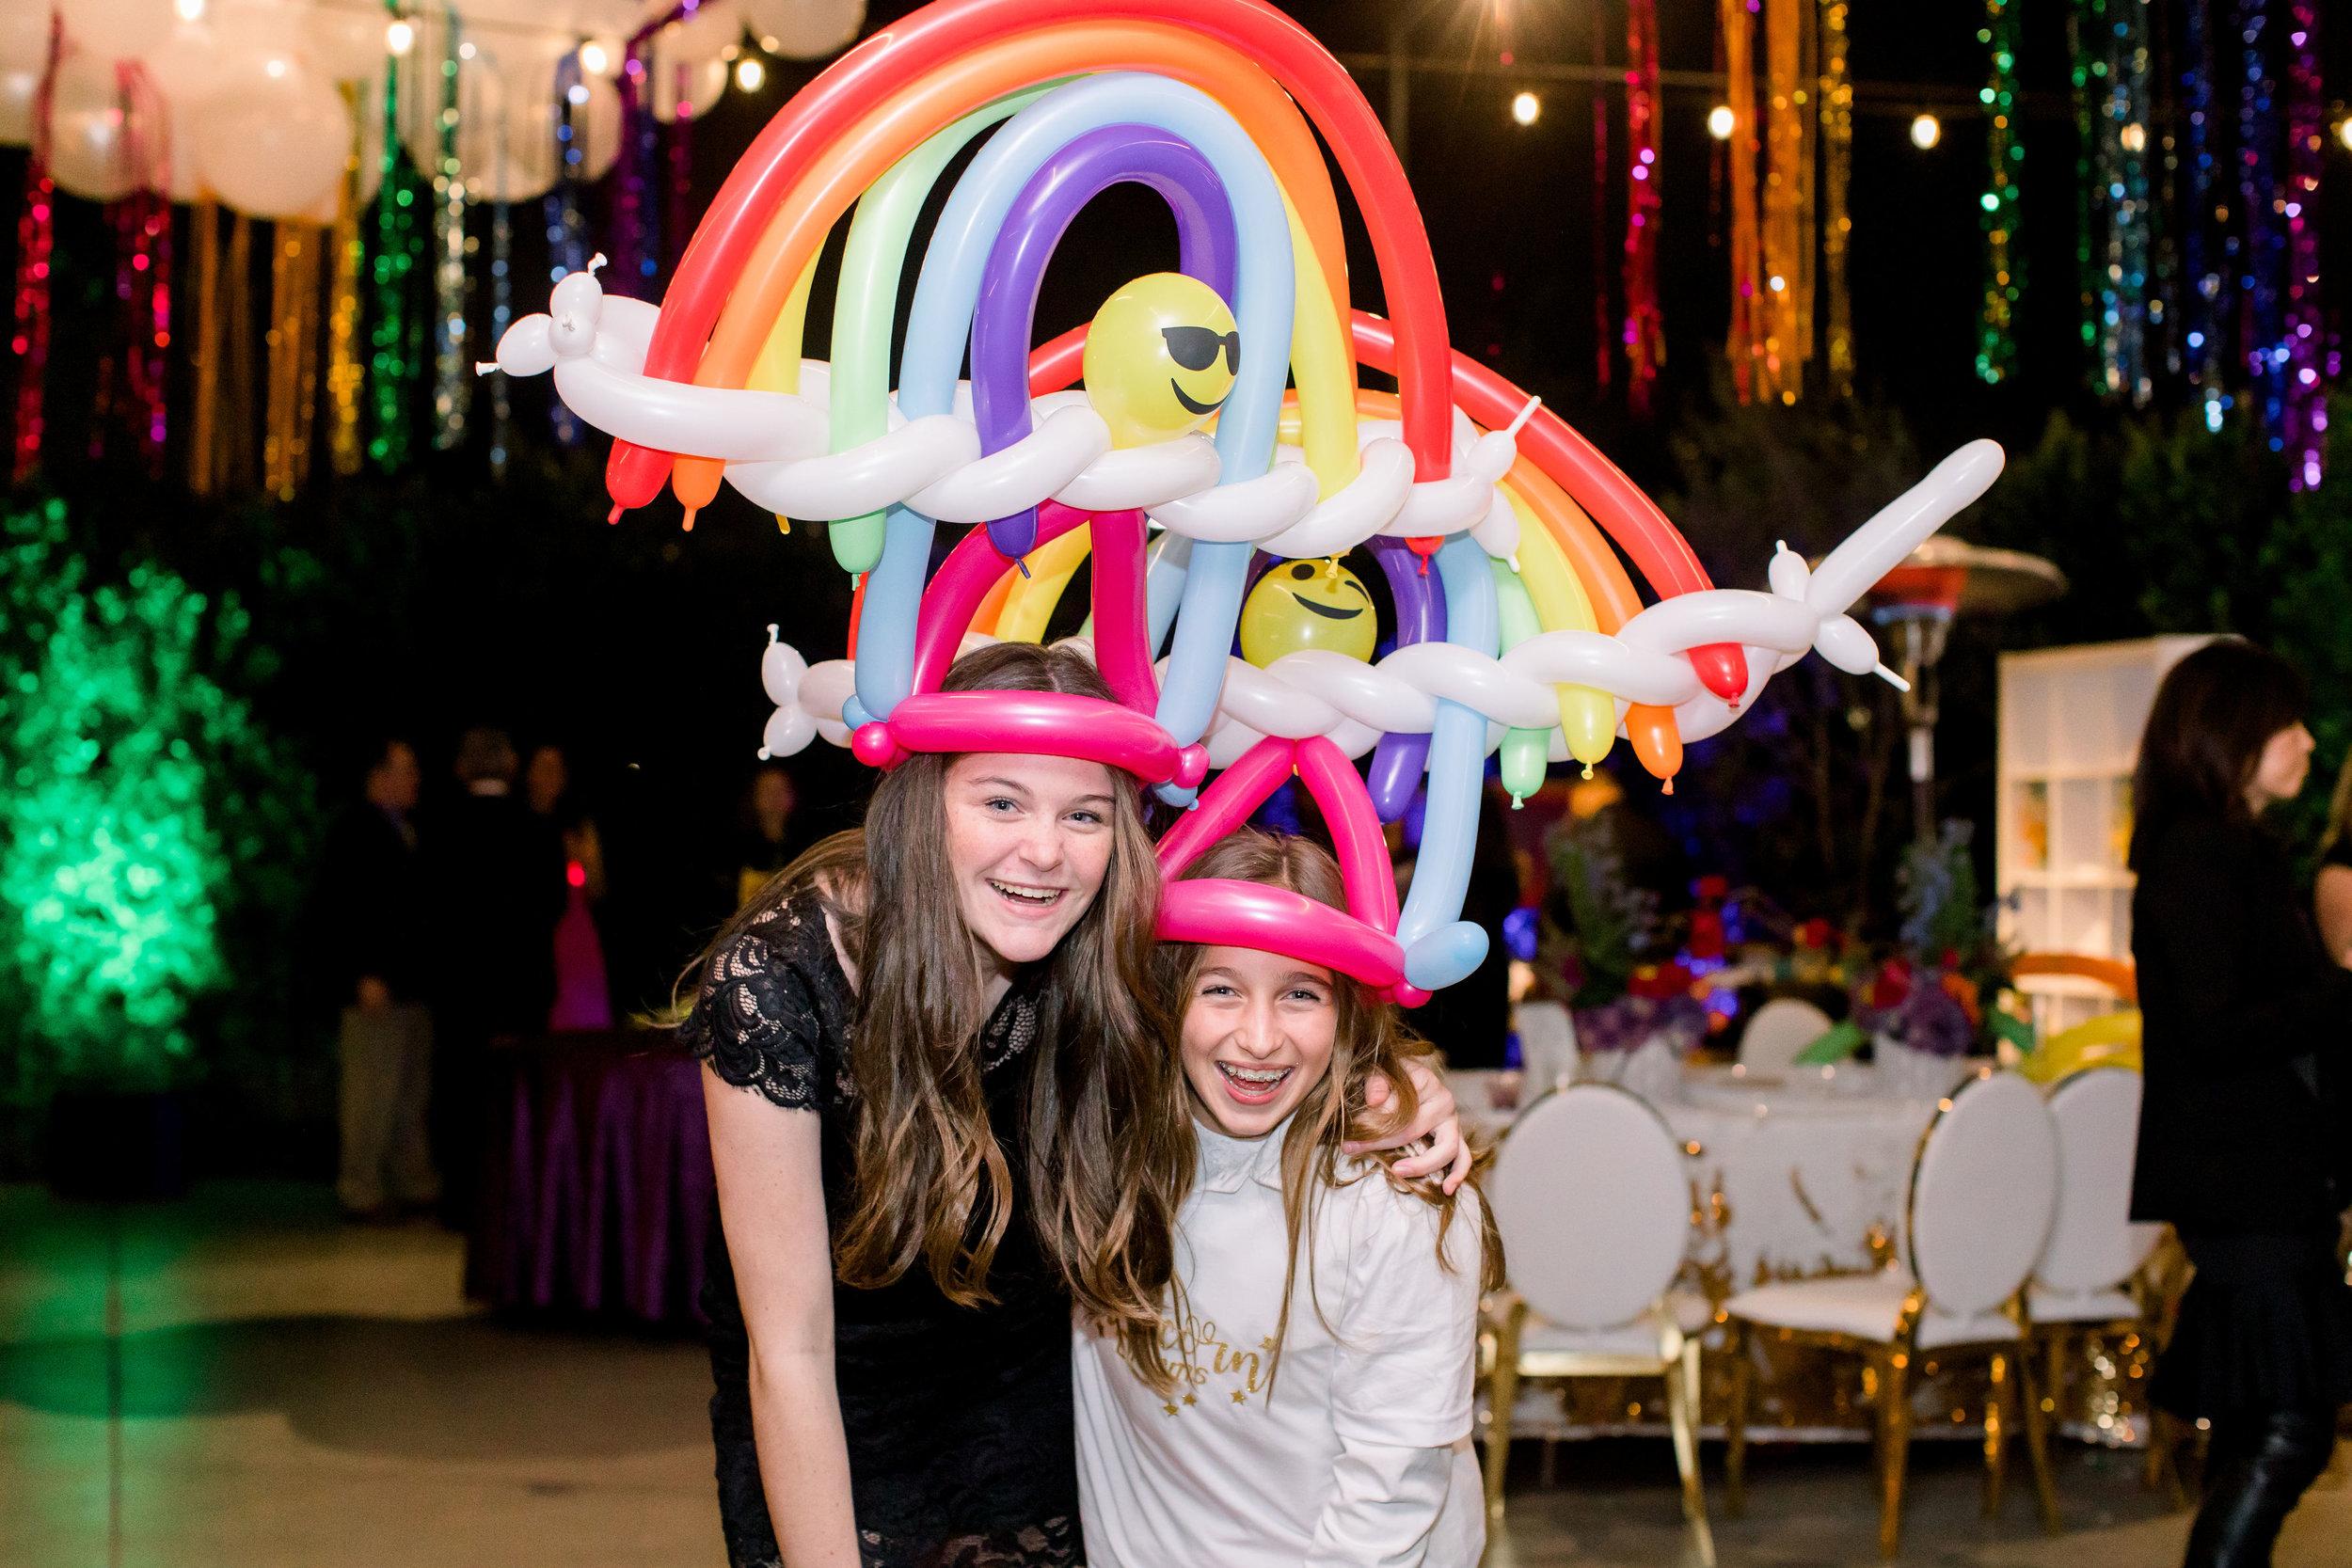 58 rainbow balloon hat custom balloon creation balloon twister rainbow bat mitzvah party entertainment Life Design Events photos by Stephanie Heymann Photography.jpg